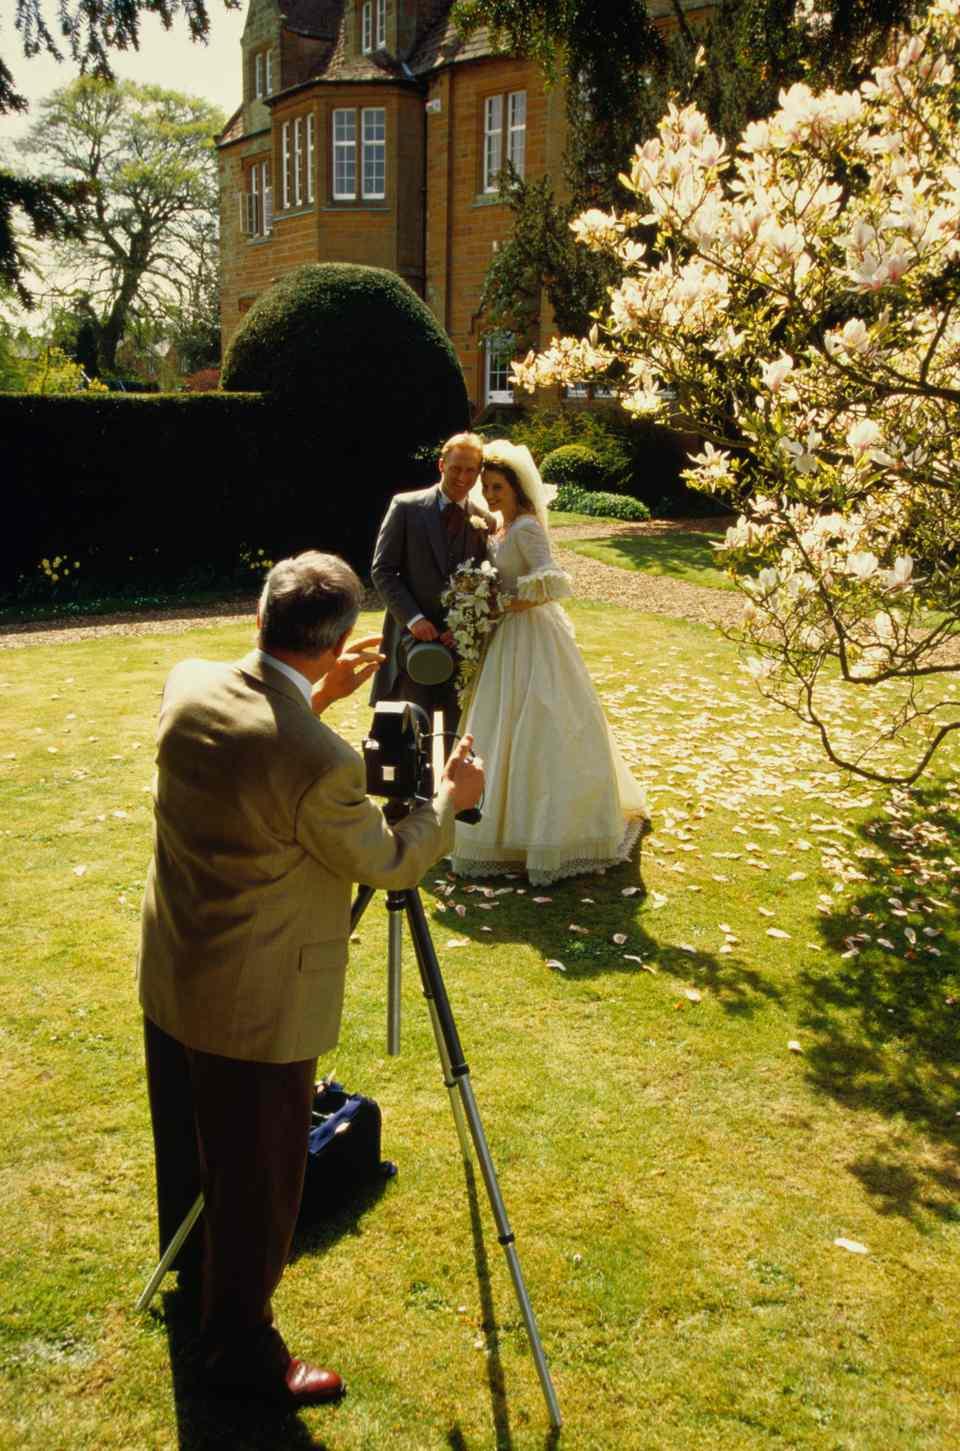 wedding photographer and newlywed couple